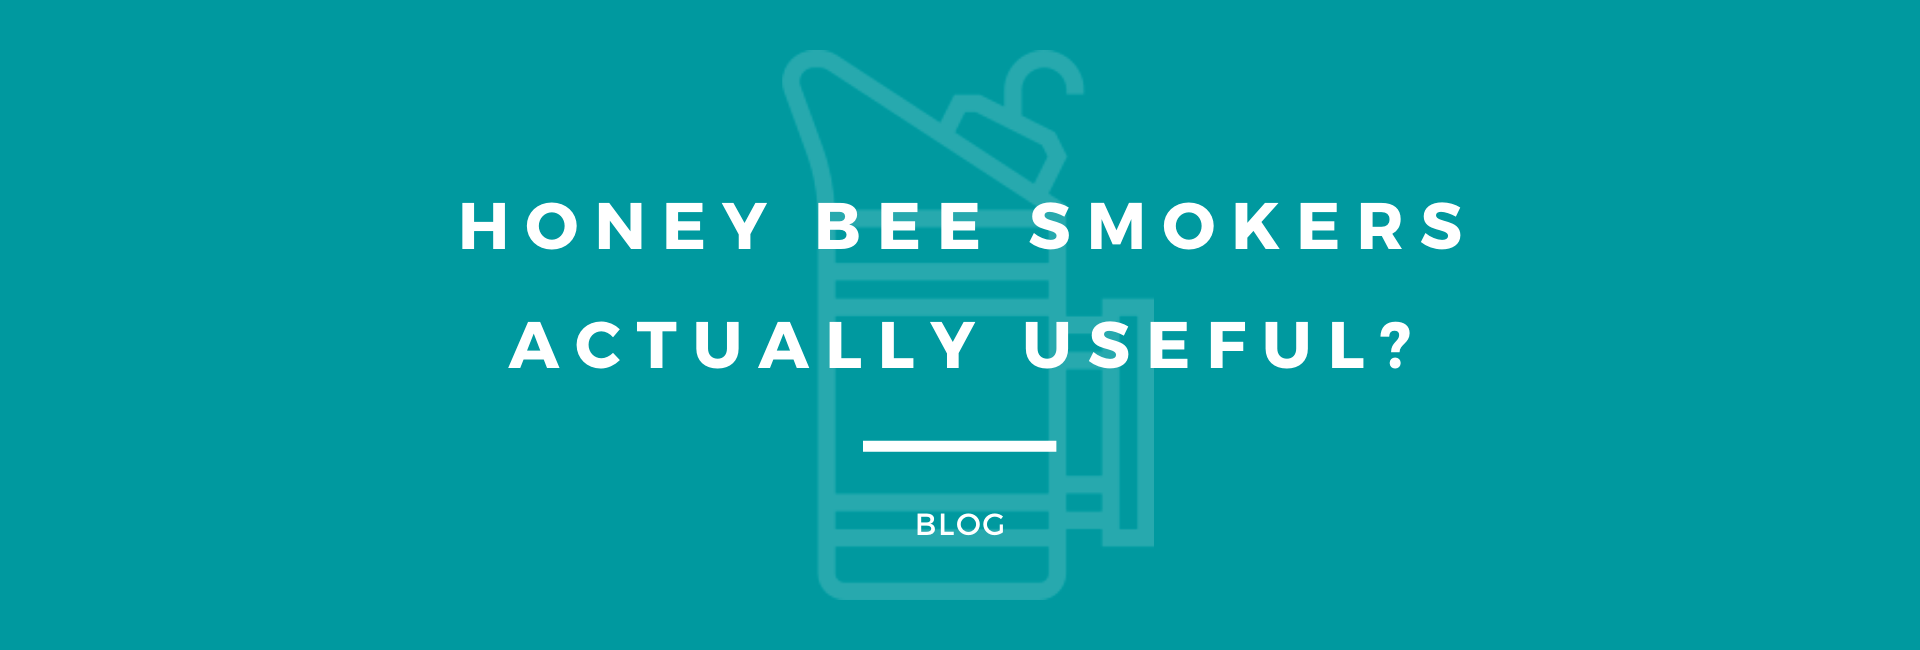 Honey Bee Smoker Usefulness - Featured